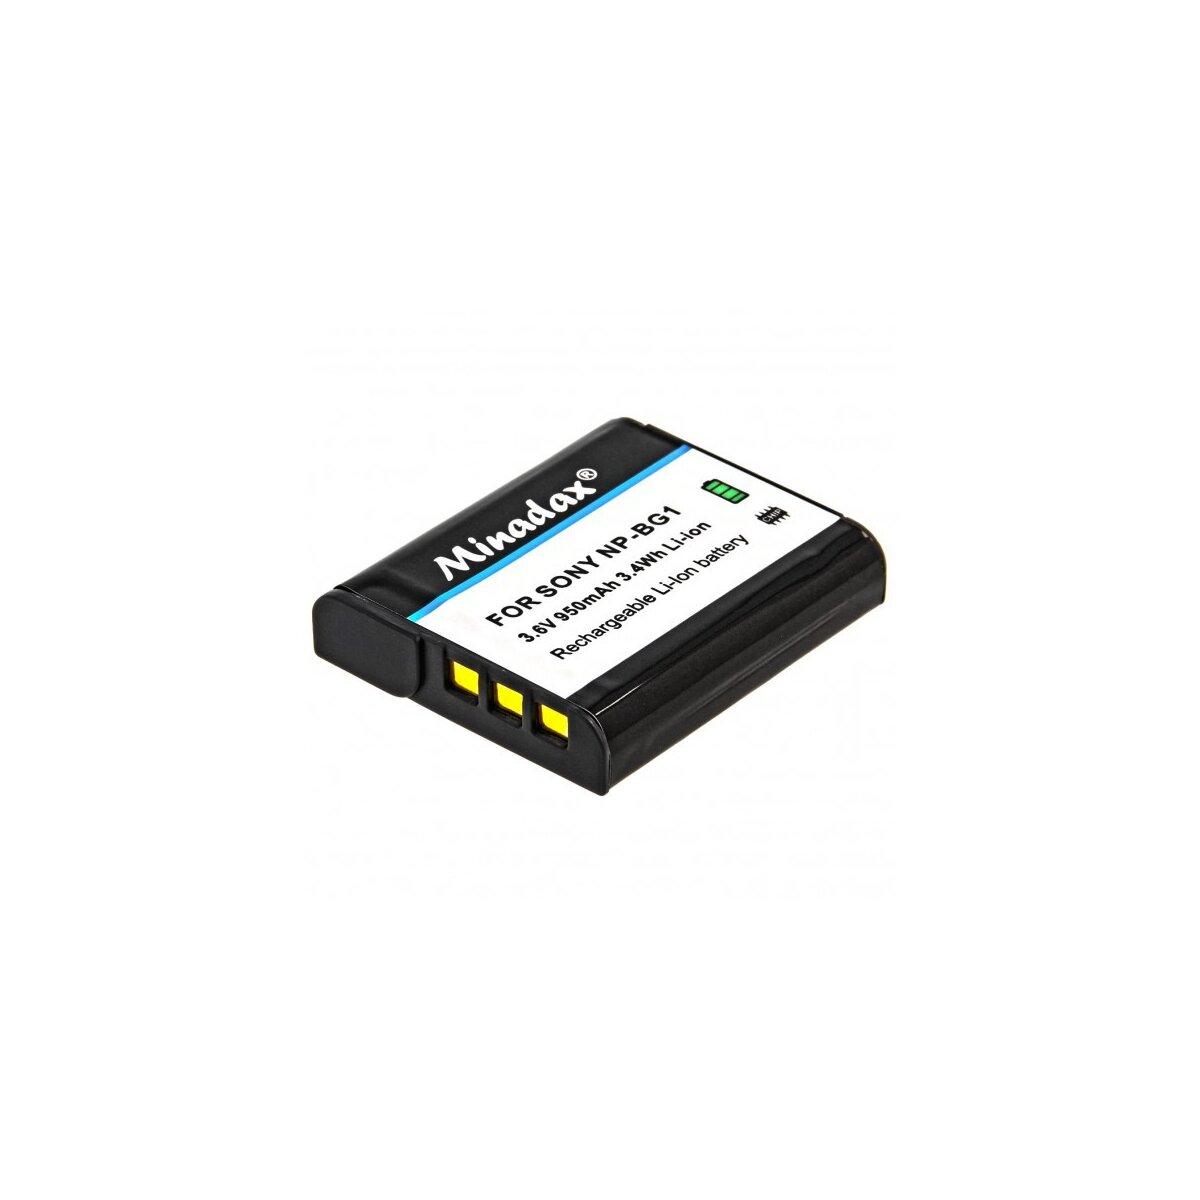 Minadax Qualitätsakku mit echten 950 mAh kompatibel für Sony CyberShot DSC HX20V HX10V HX9V HX7V HX5V H90 H70 H55 WX10 WX1 etc., Ersatz für NP-BG1 - Intelligentes Akkusystem mit Chip